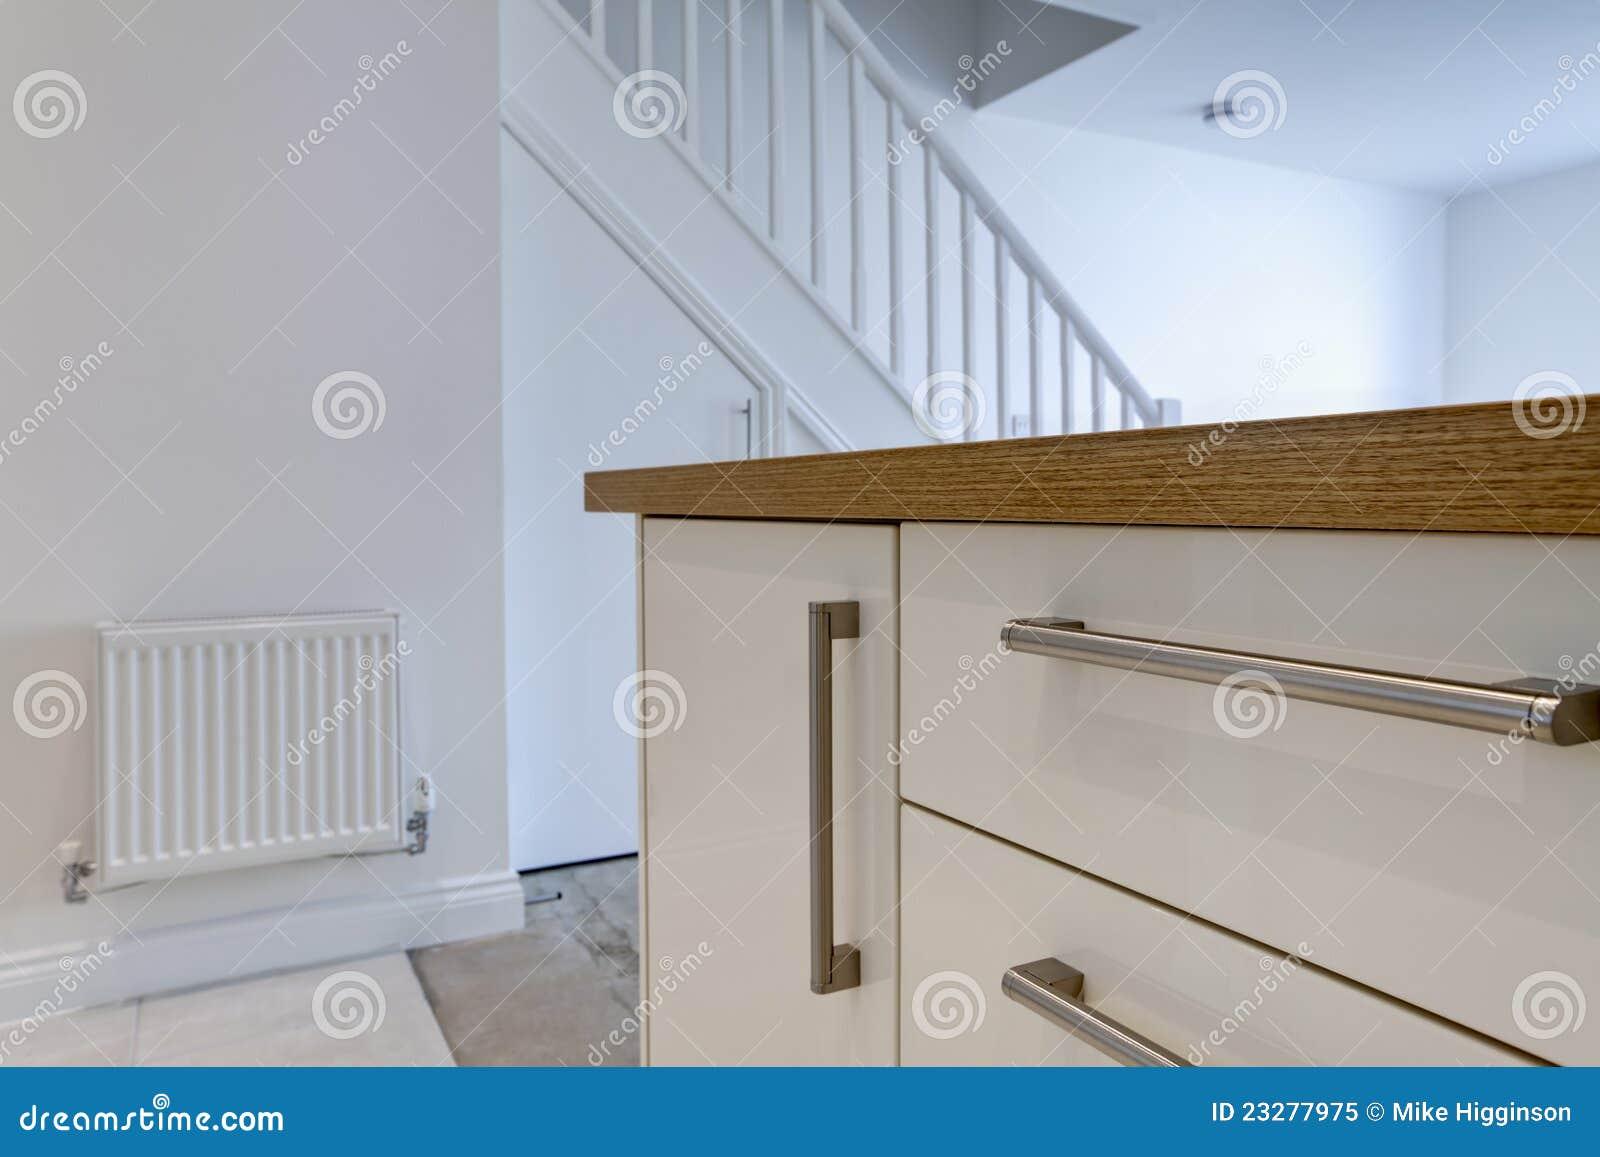 Modernes Küchedetail